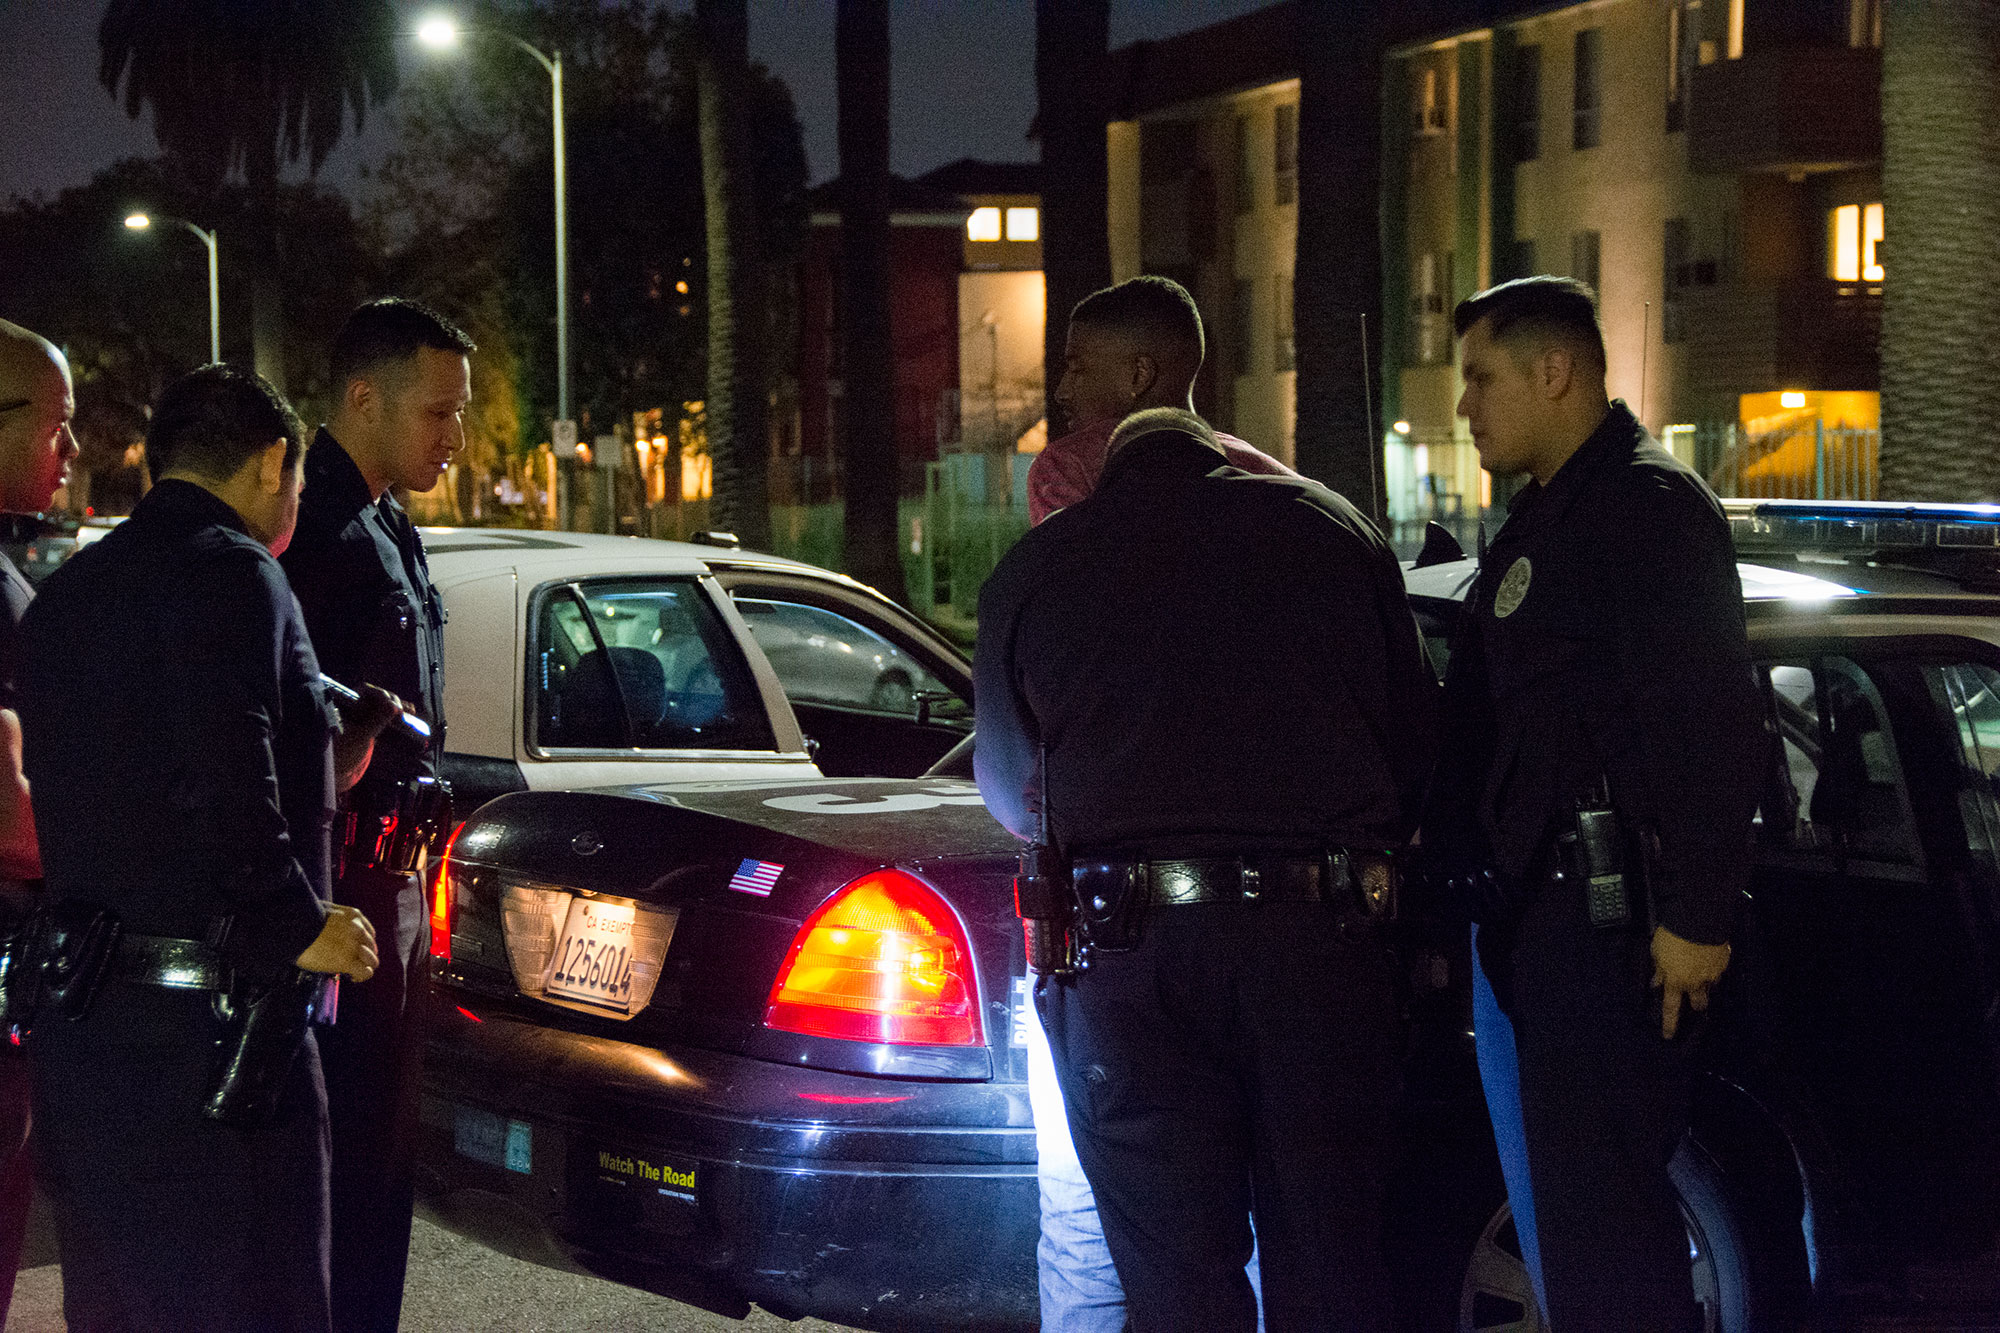 LAPD took the suspect into custody at approximately 7:37 p.m. | Mariya Dondonyan